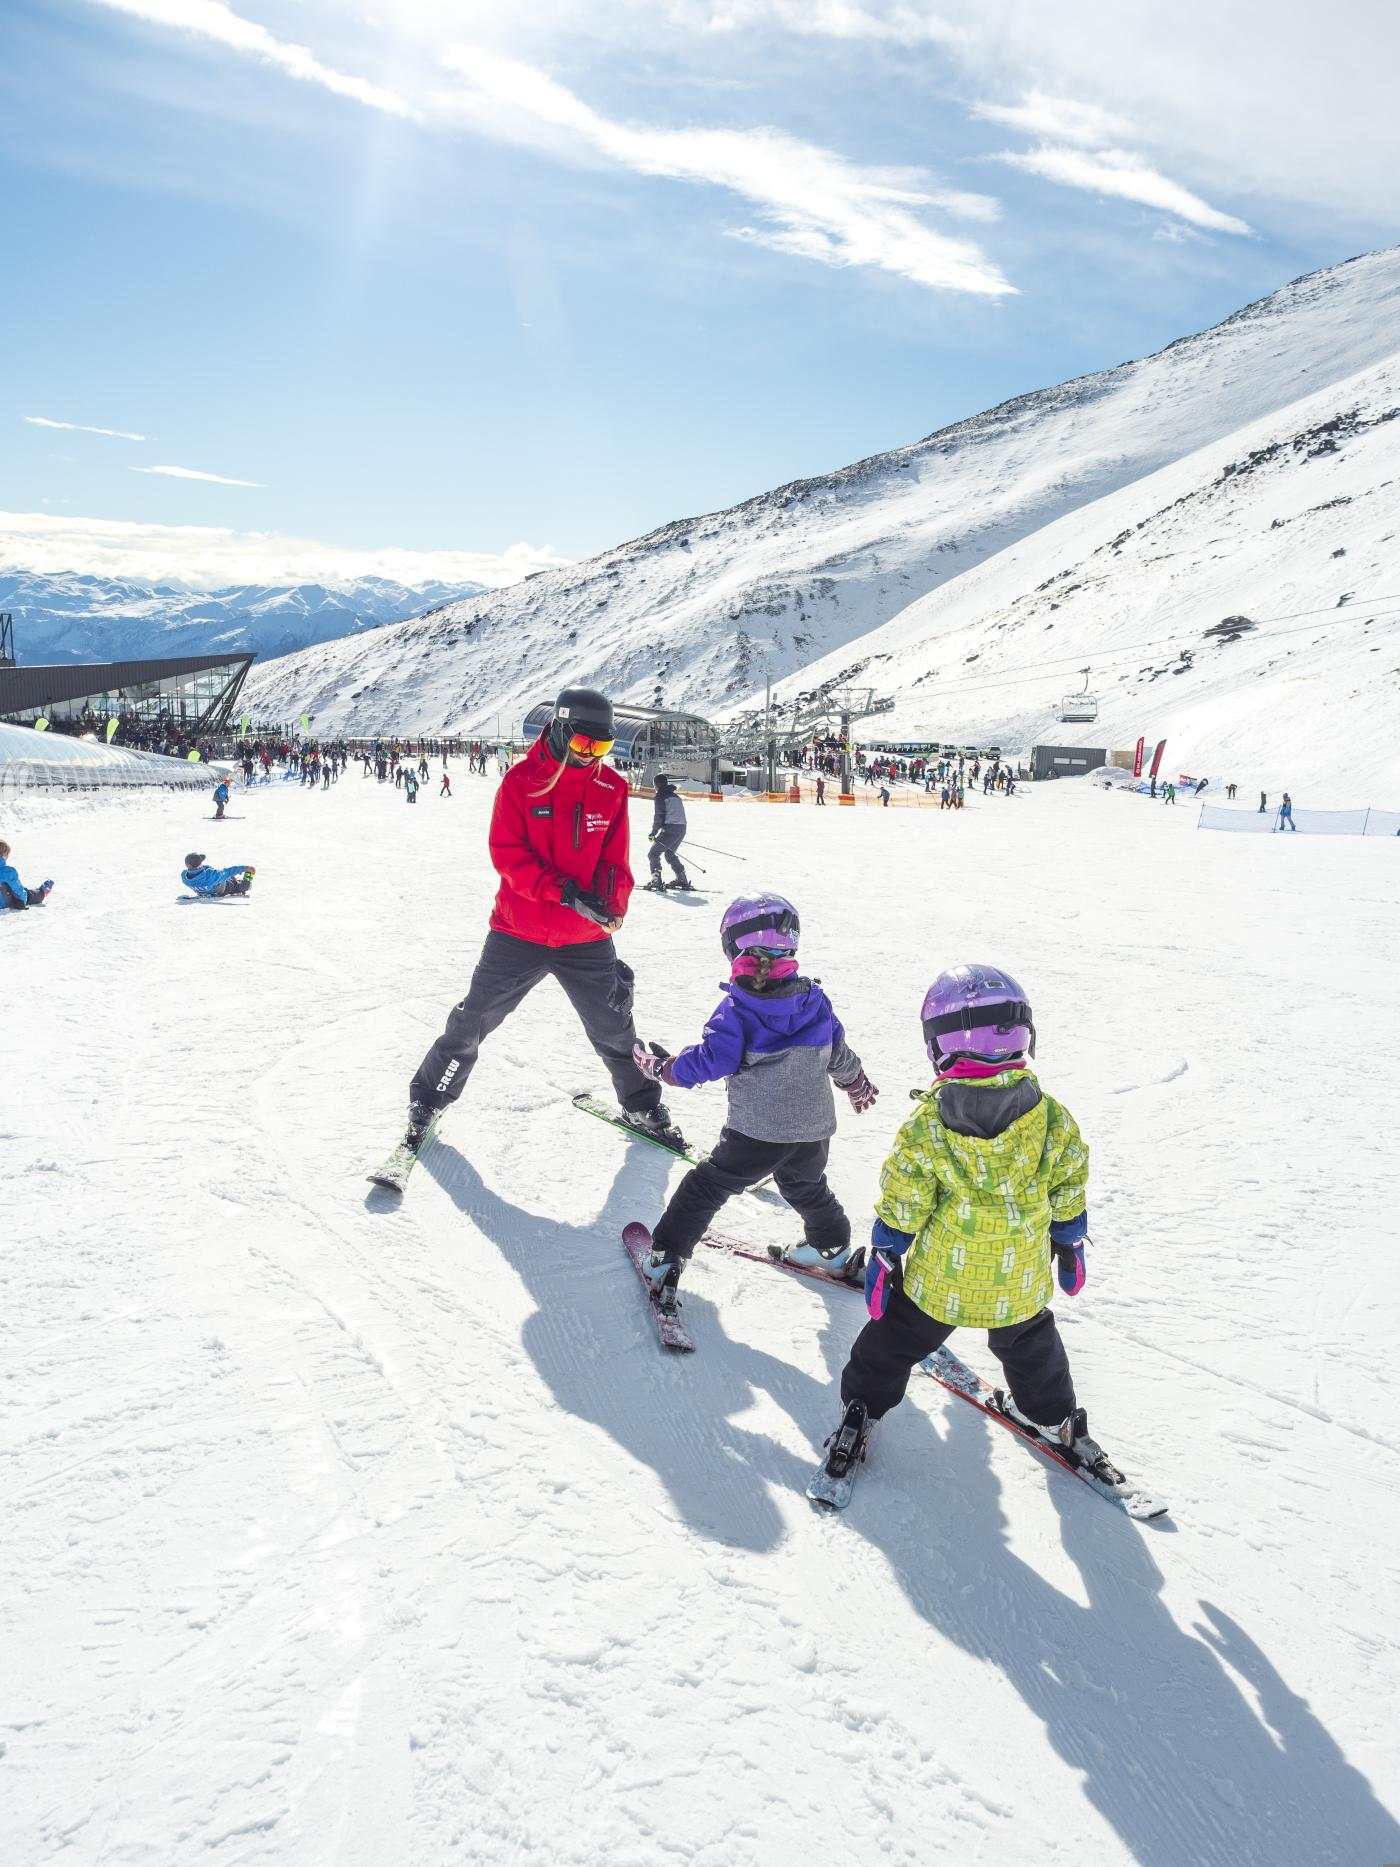 Kids Ski lesson at The Remarkables